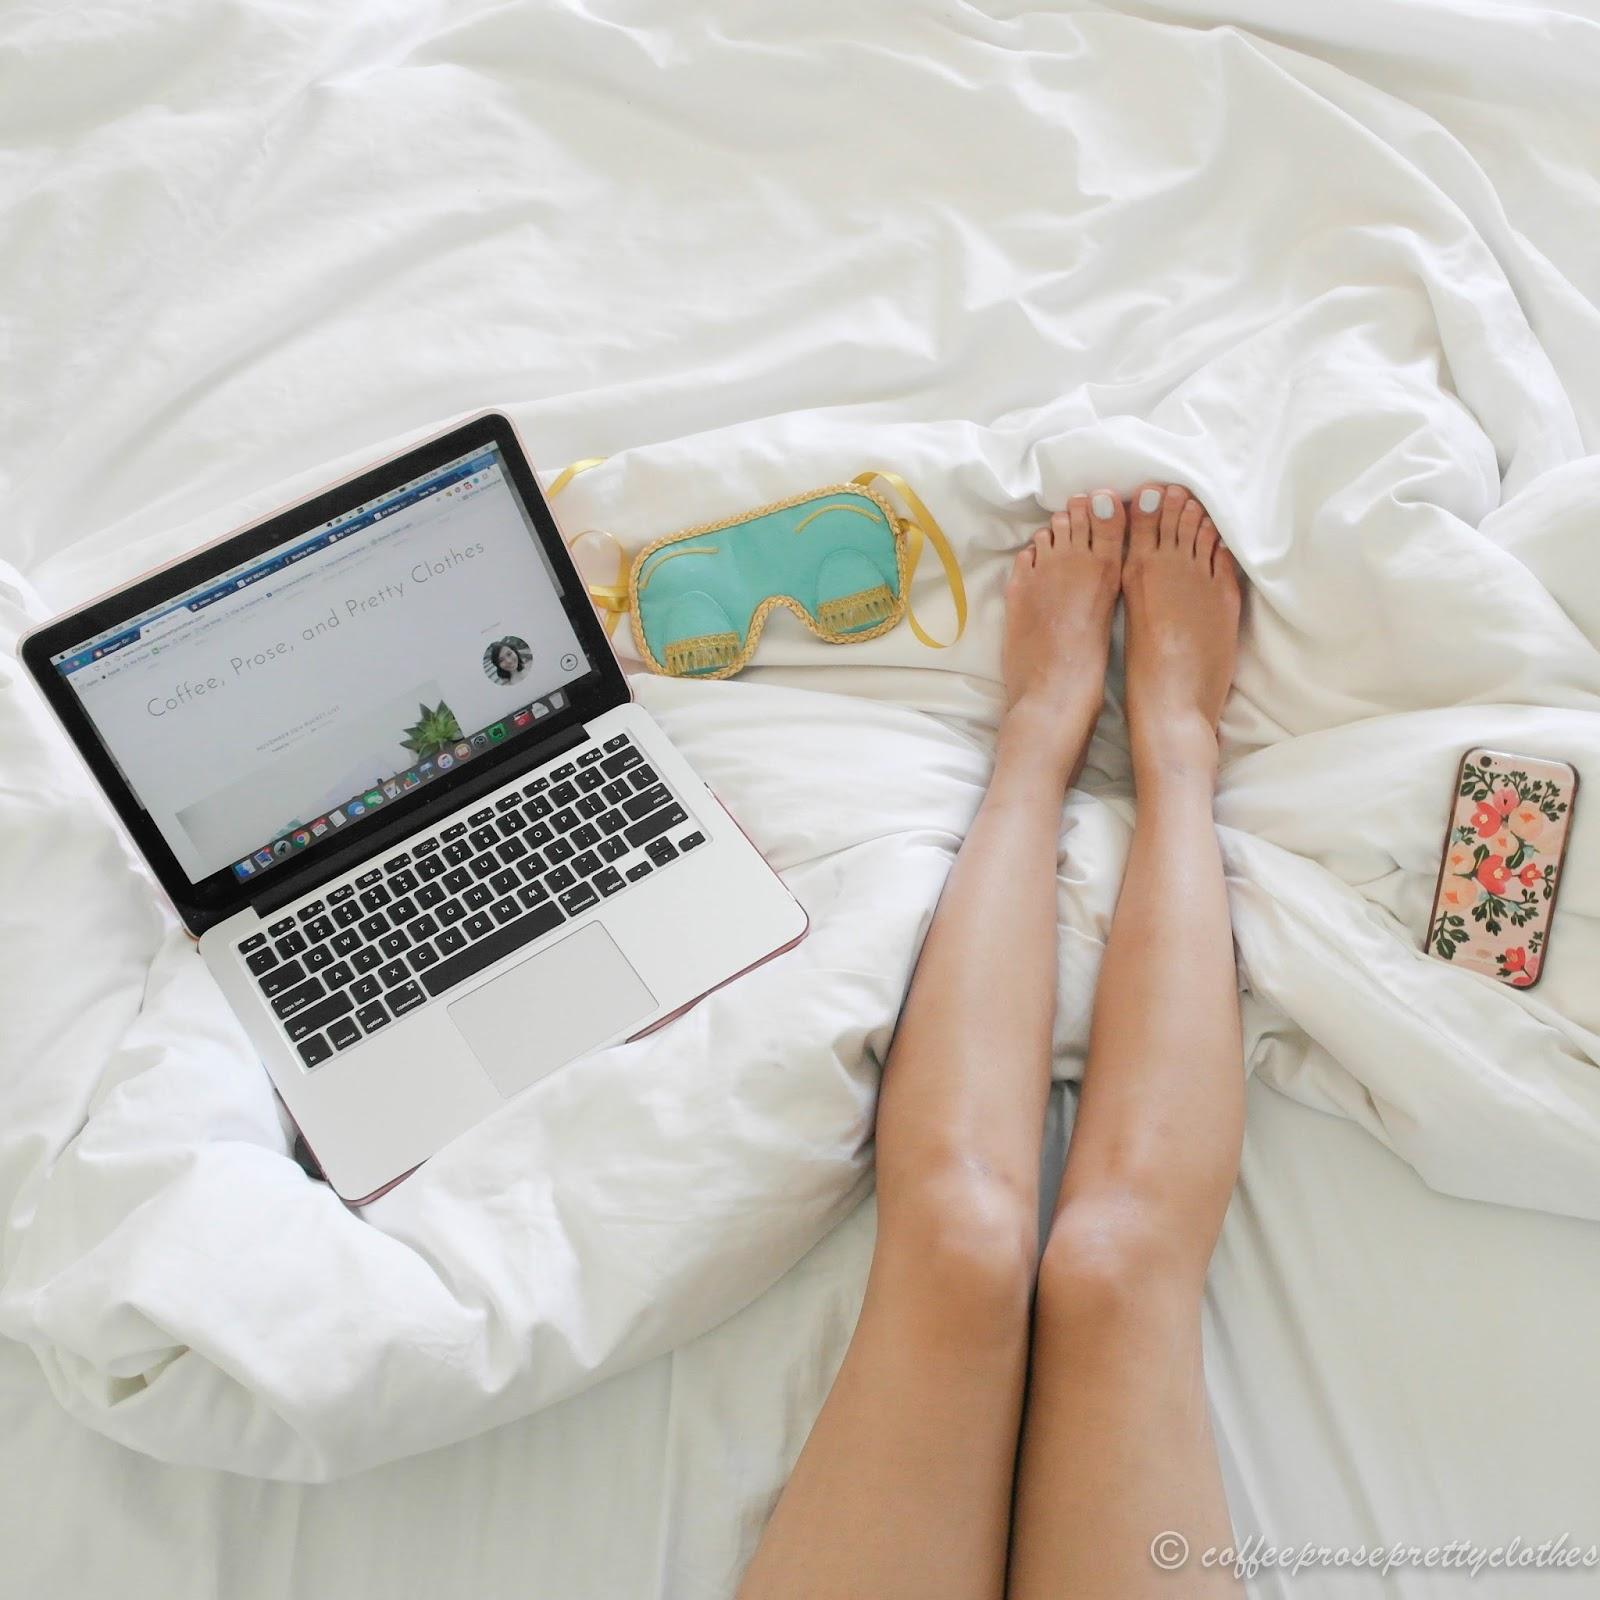 self-care, macbook, bed